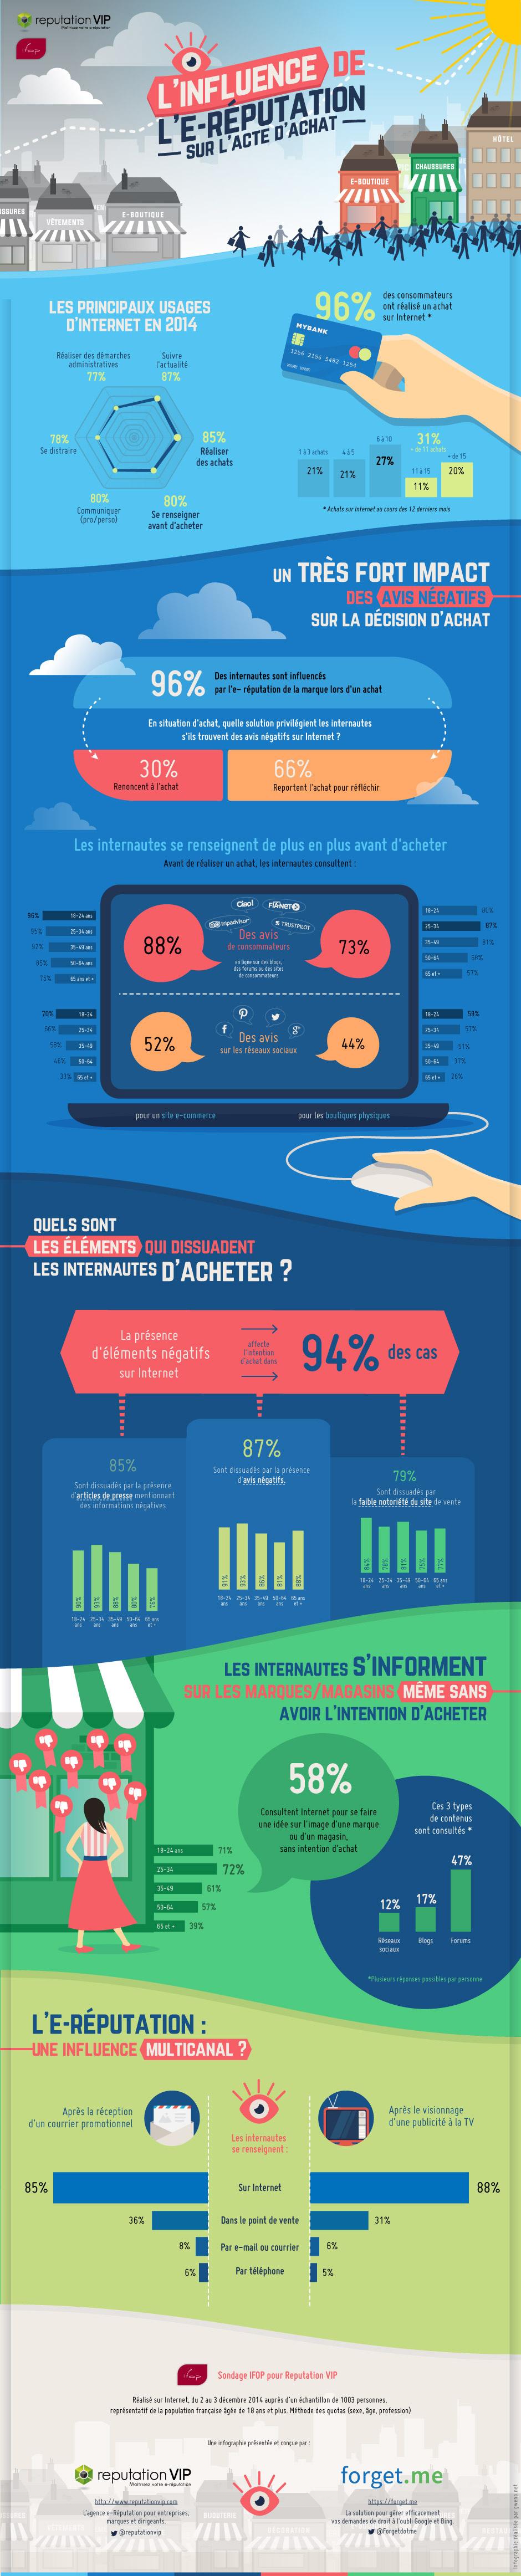 infographie E-reputation Acte Achat